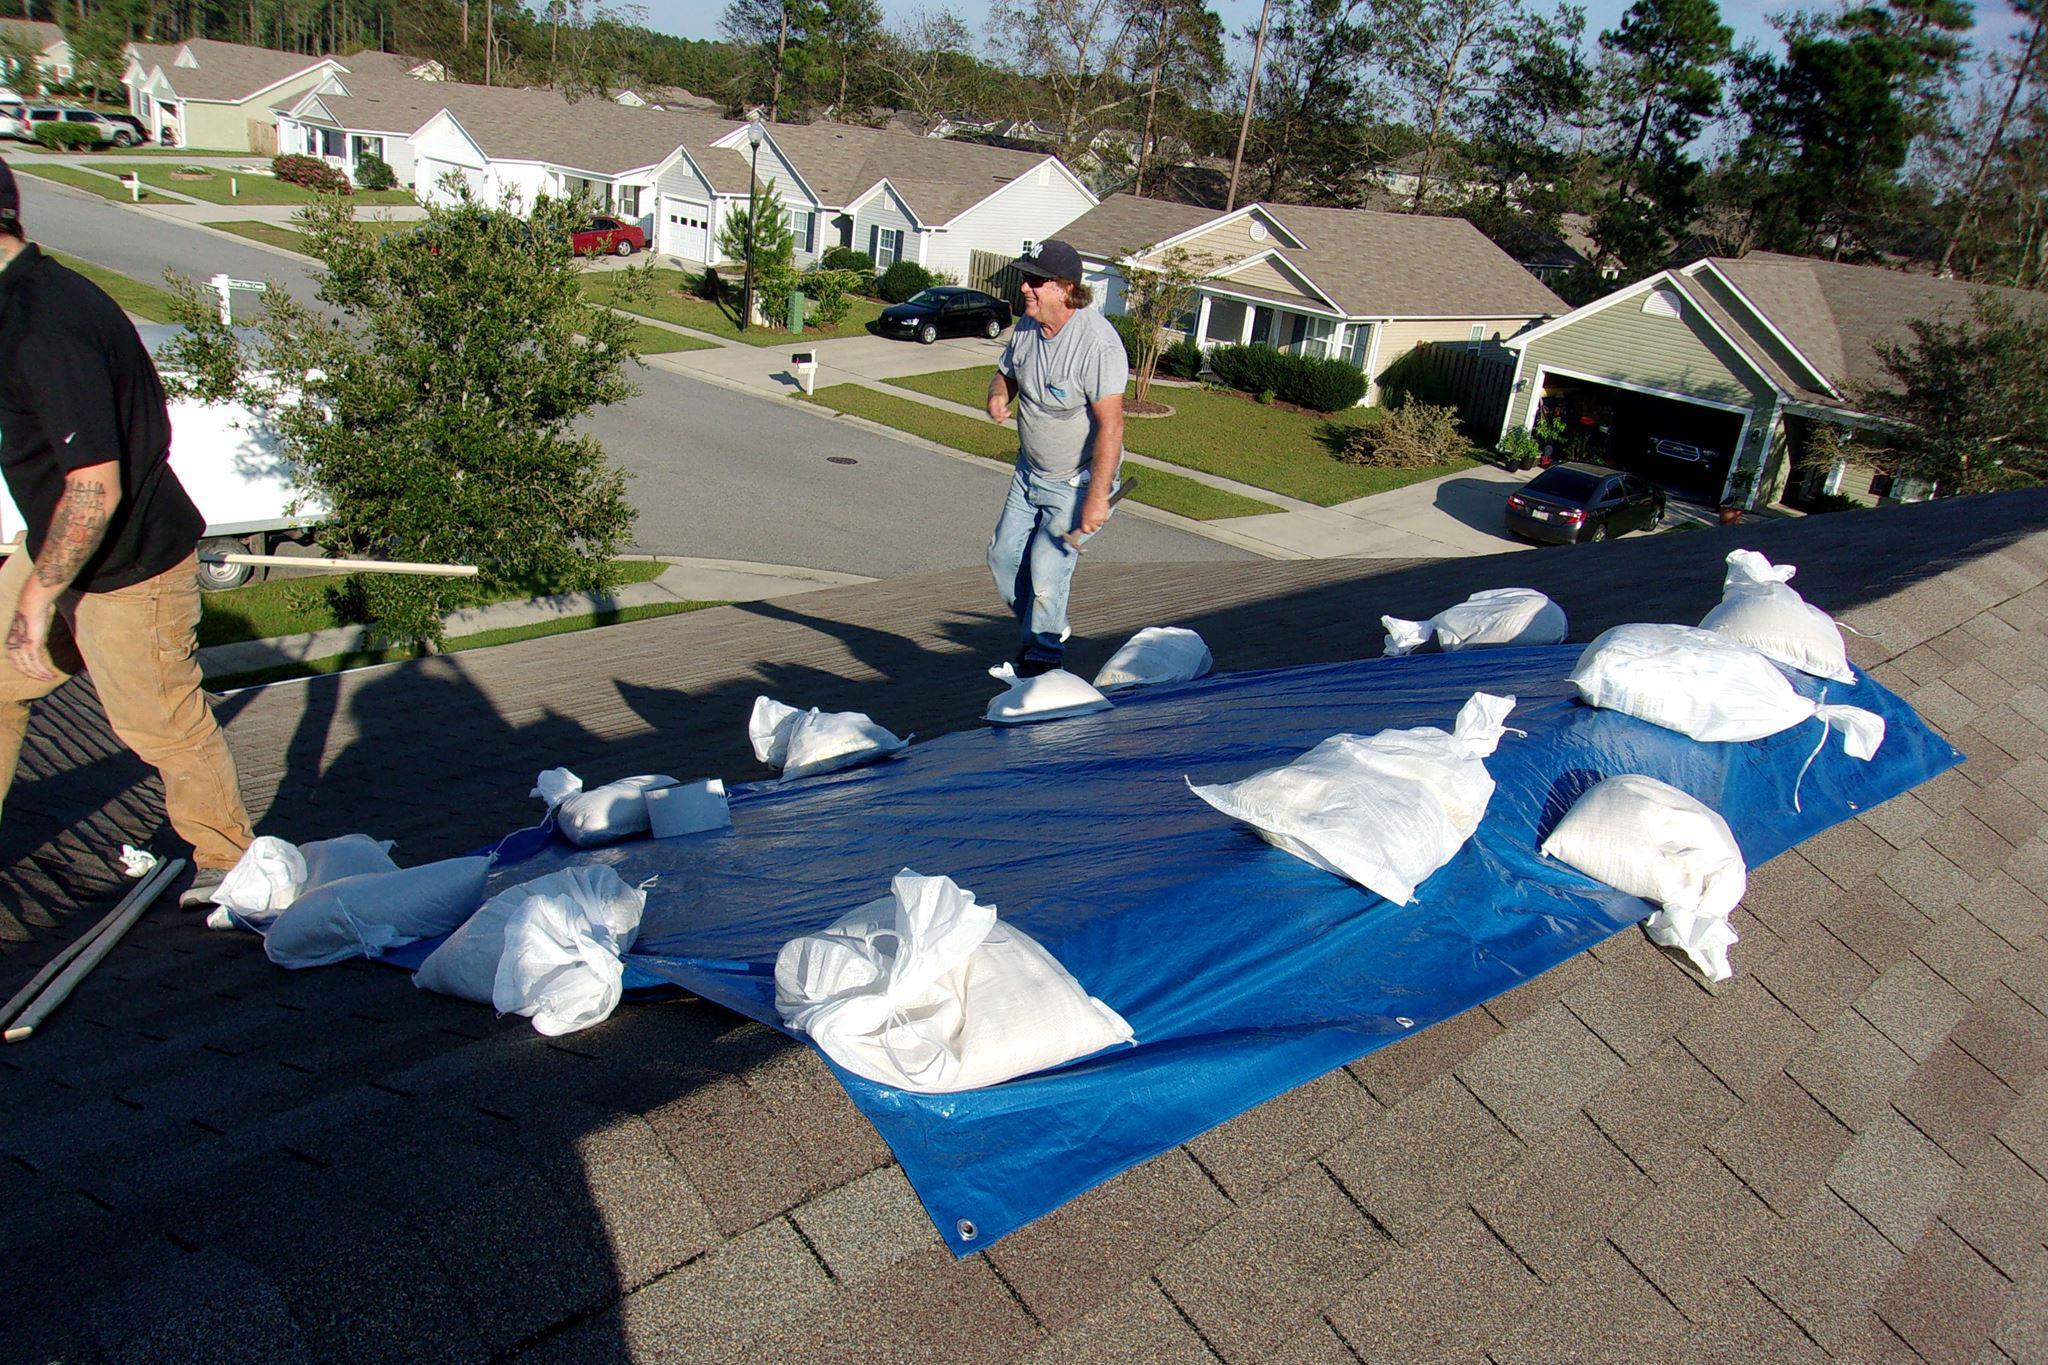 EE&G Restoration Atlanta, Water Damage Restoration, Fire Damage, Mold Remediation and Removal image 25